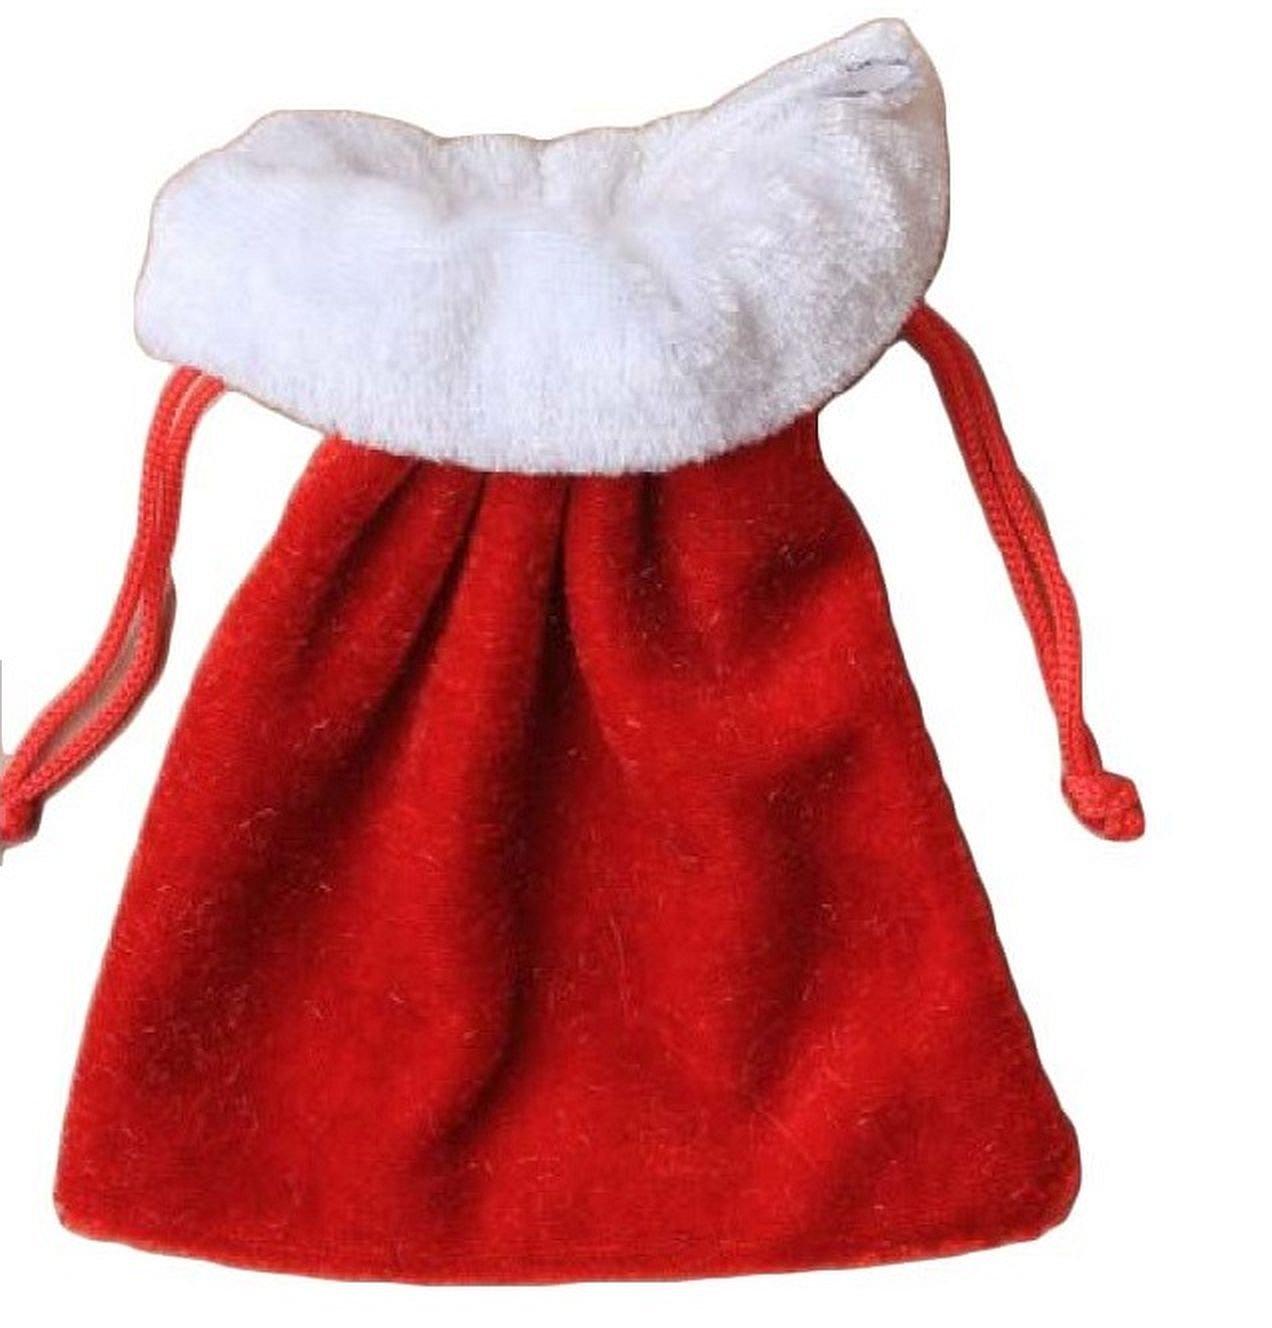 ALANNAHS ACCESSORIES 5/3/2 Pack Christmas Xmas Red Velvet Santa Sack Drawstring & Stocking Gift Bag 3 Sizes